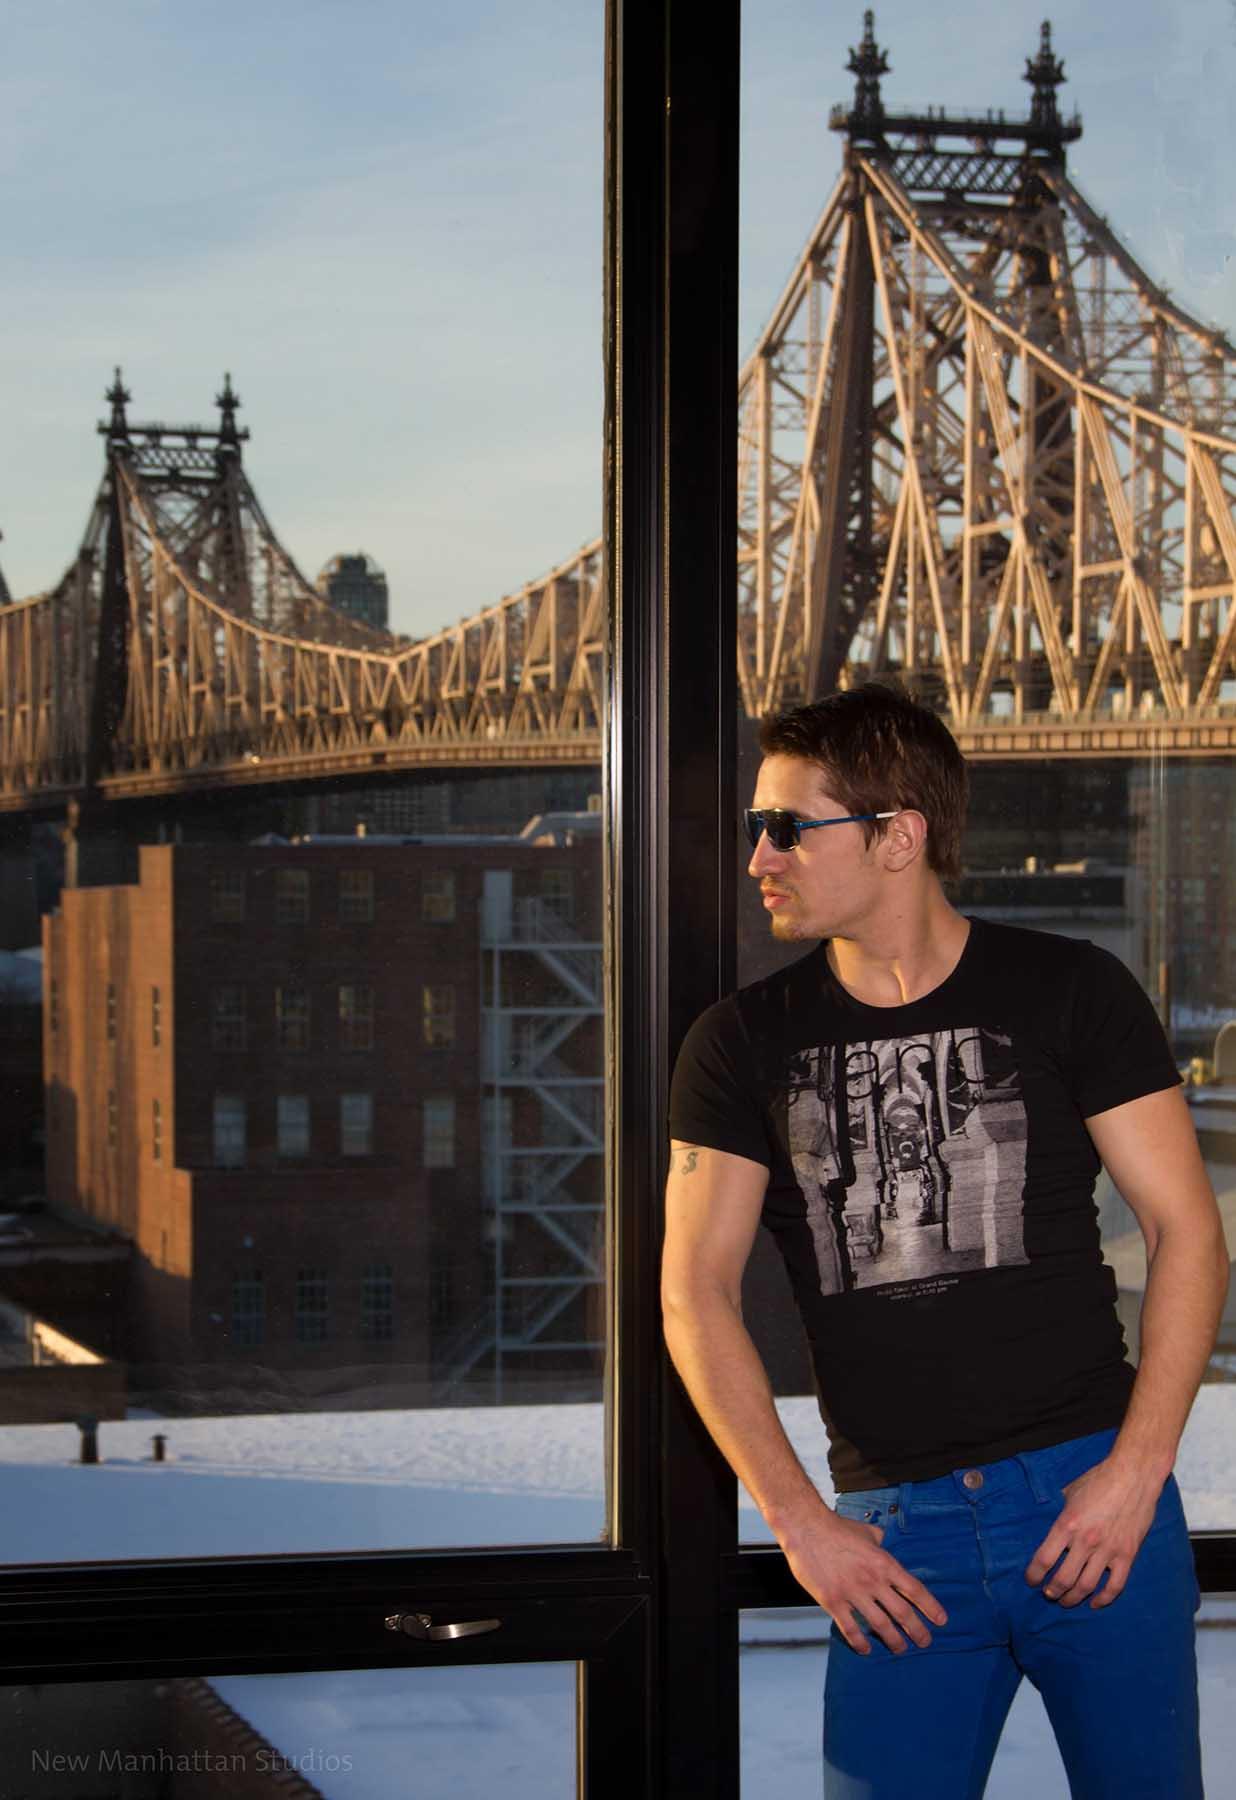 Claudiu X Wes Triplett X New Manhattan Studios x YUP MAGAZINE